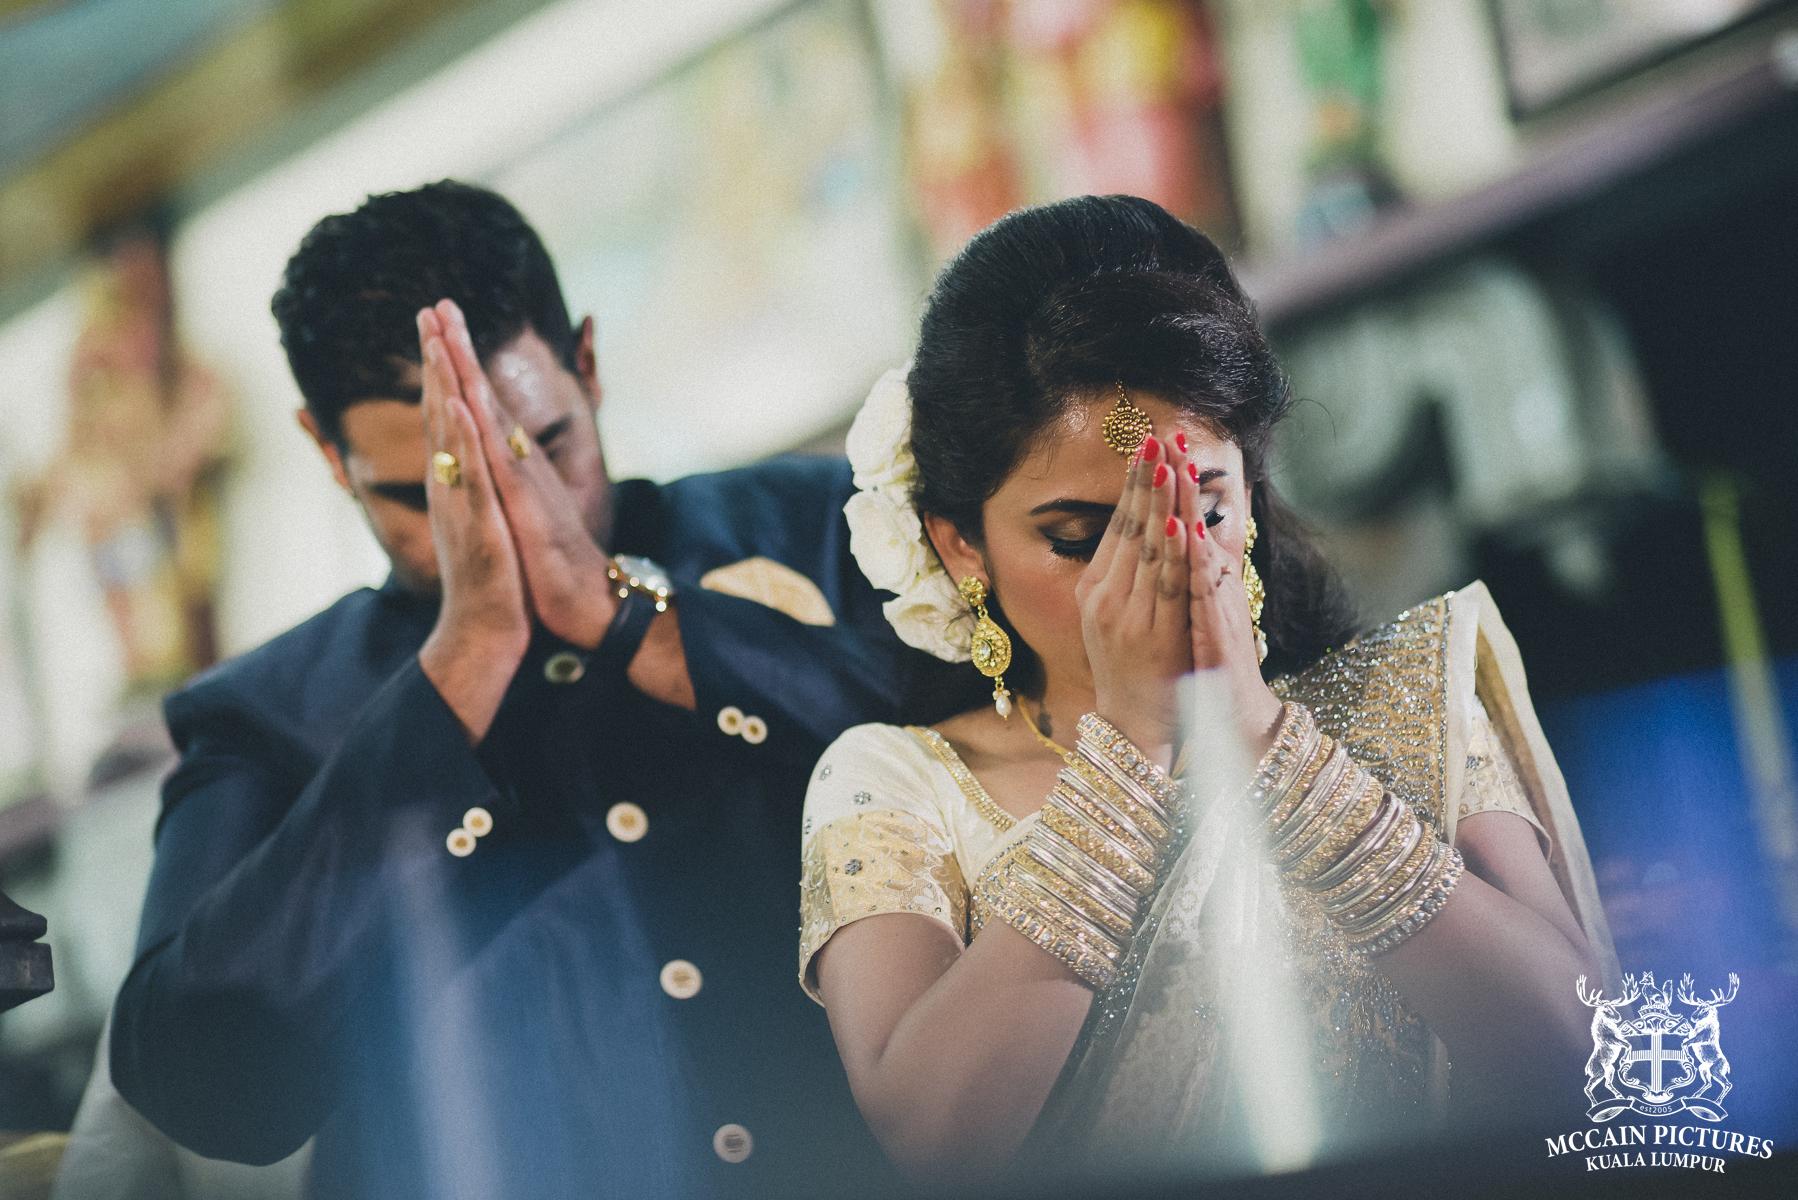 mccain goh mccain pictures wedding photographer malaysia-365